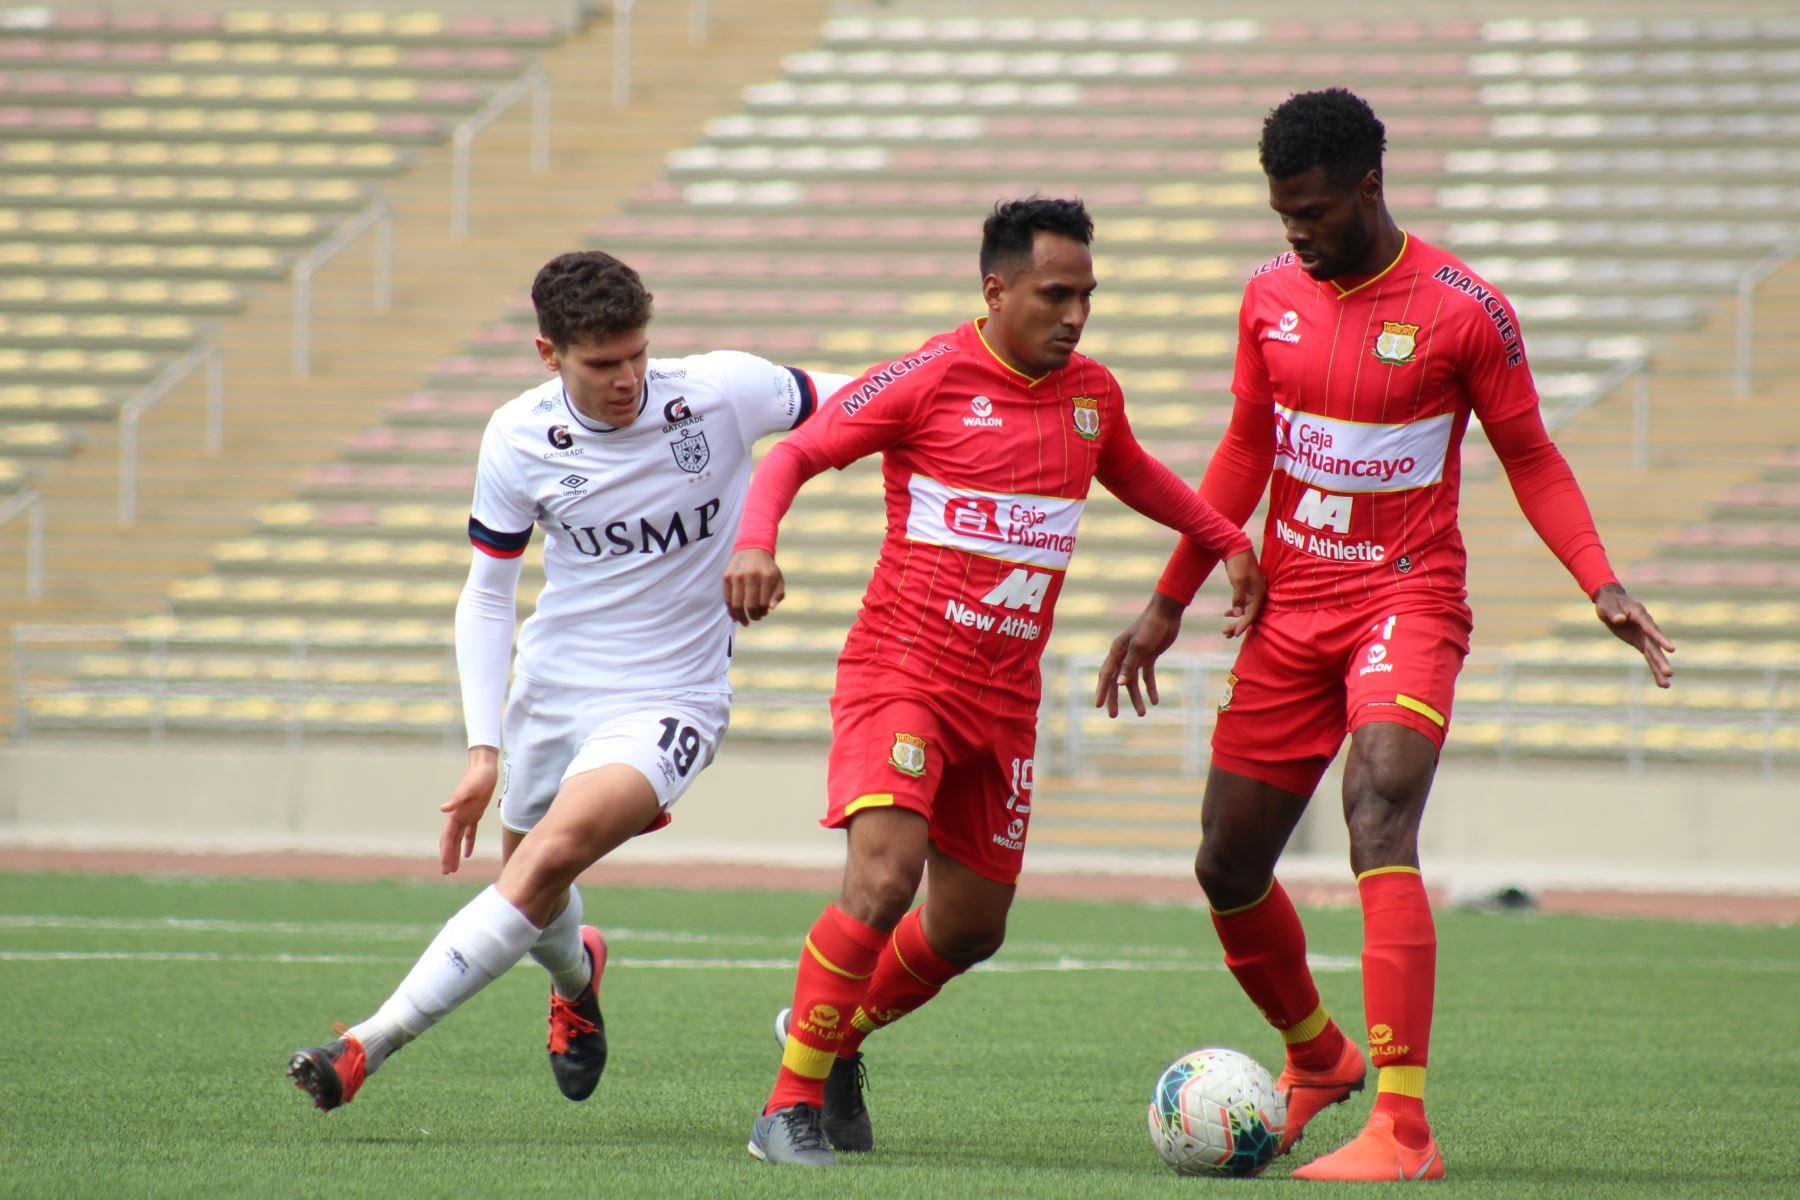 Sport Huancayo y U. San Martín  se enfrentan por la fecha 14 del Torneo Apertura. Foto: Liga 1 en el estadio San Marcos. Foto: @LigaFutProf